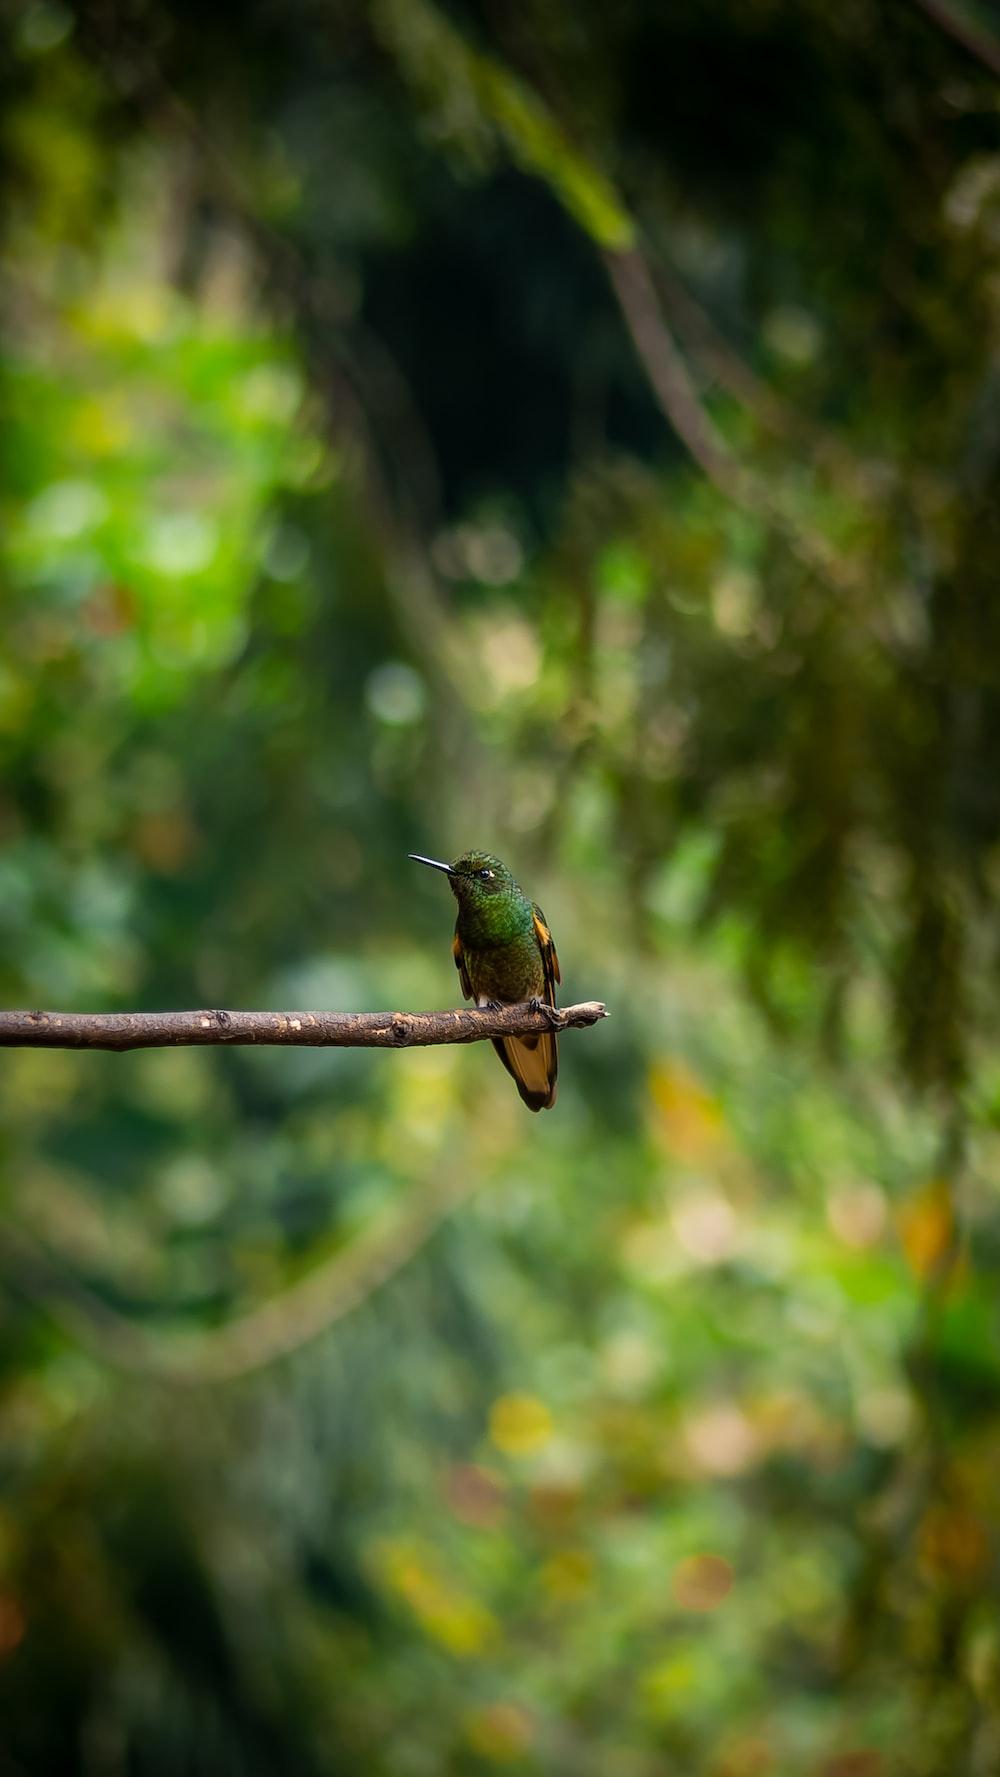 green and brown humming bird